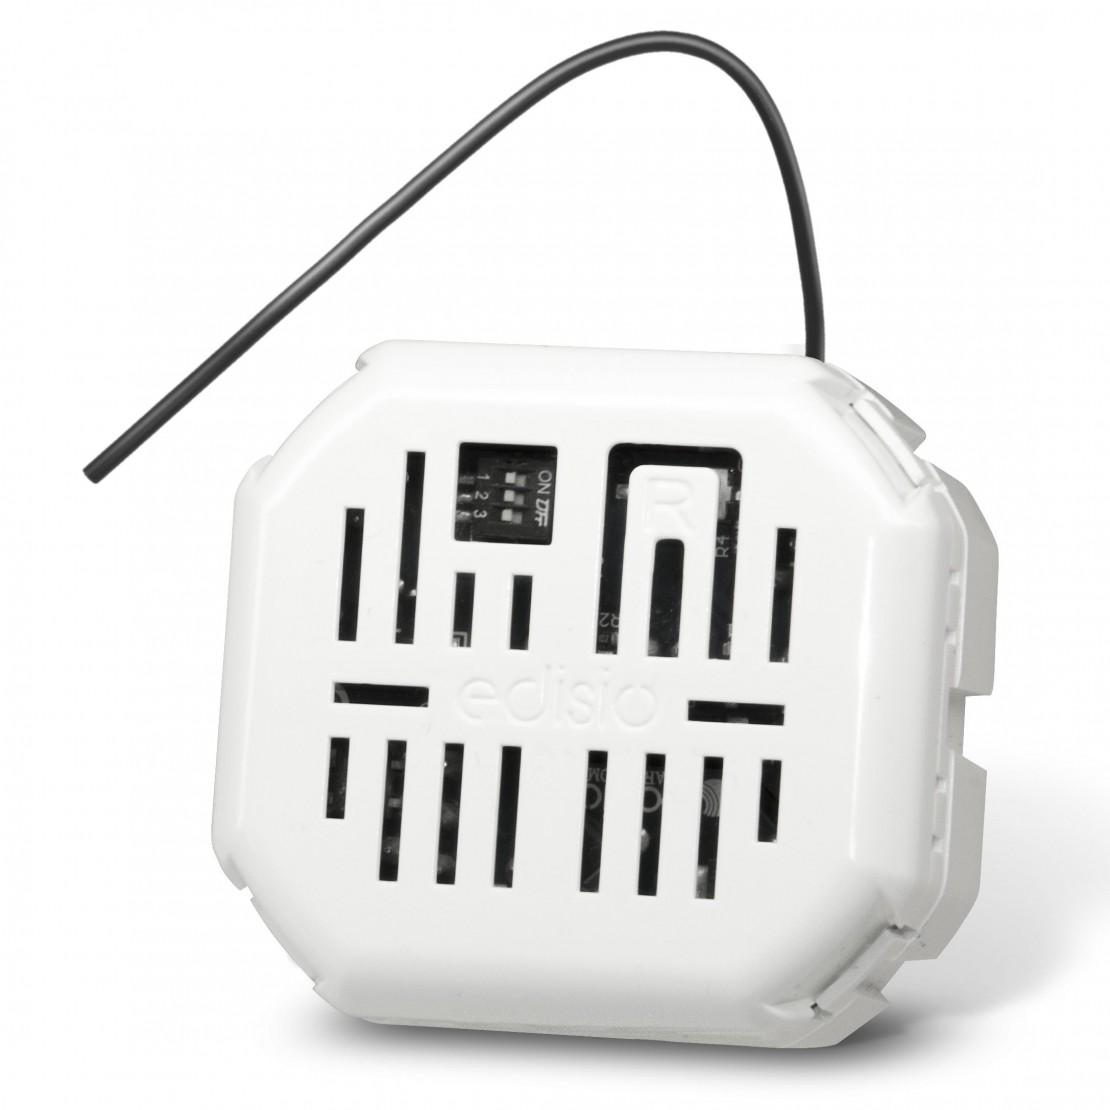 Micromódulo variador emissor/recetor